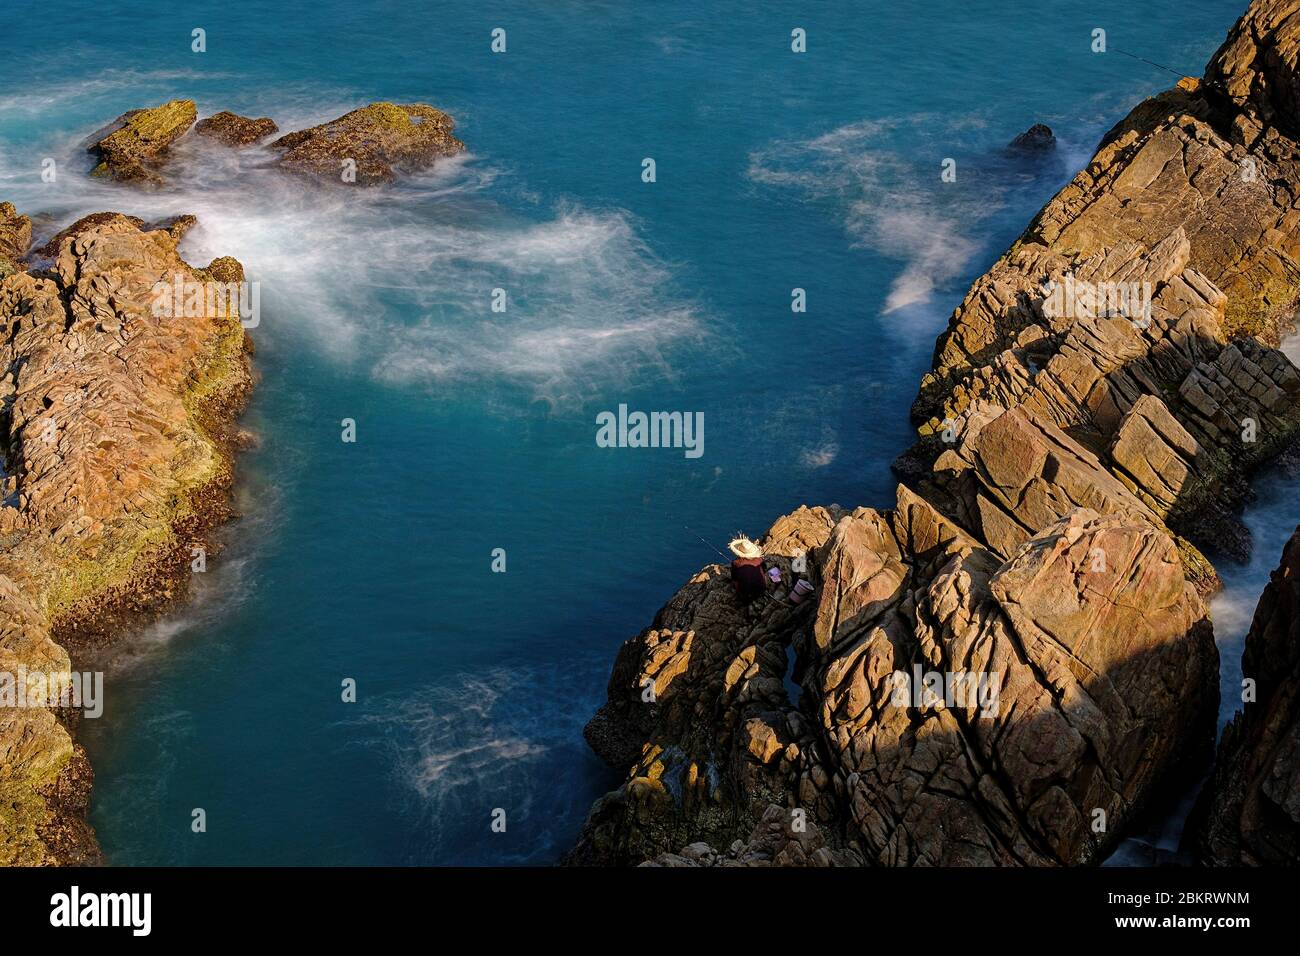 Vietnam, Phu Yen province, Ganh Da Dia, basalt rock columns, the vietnamese Giant's causeway Stock Photo